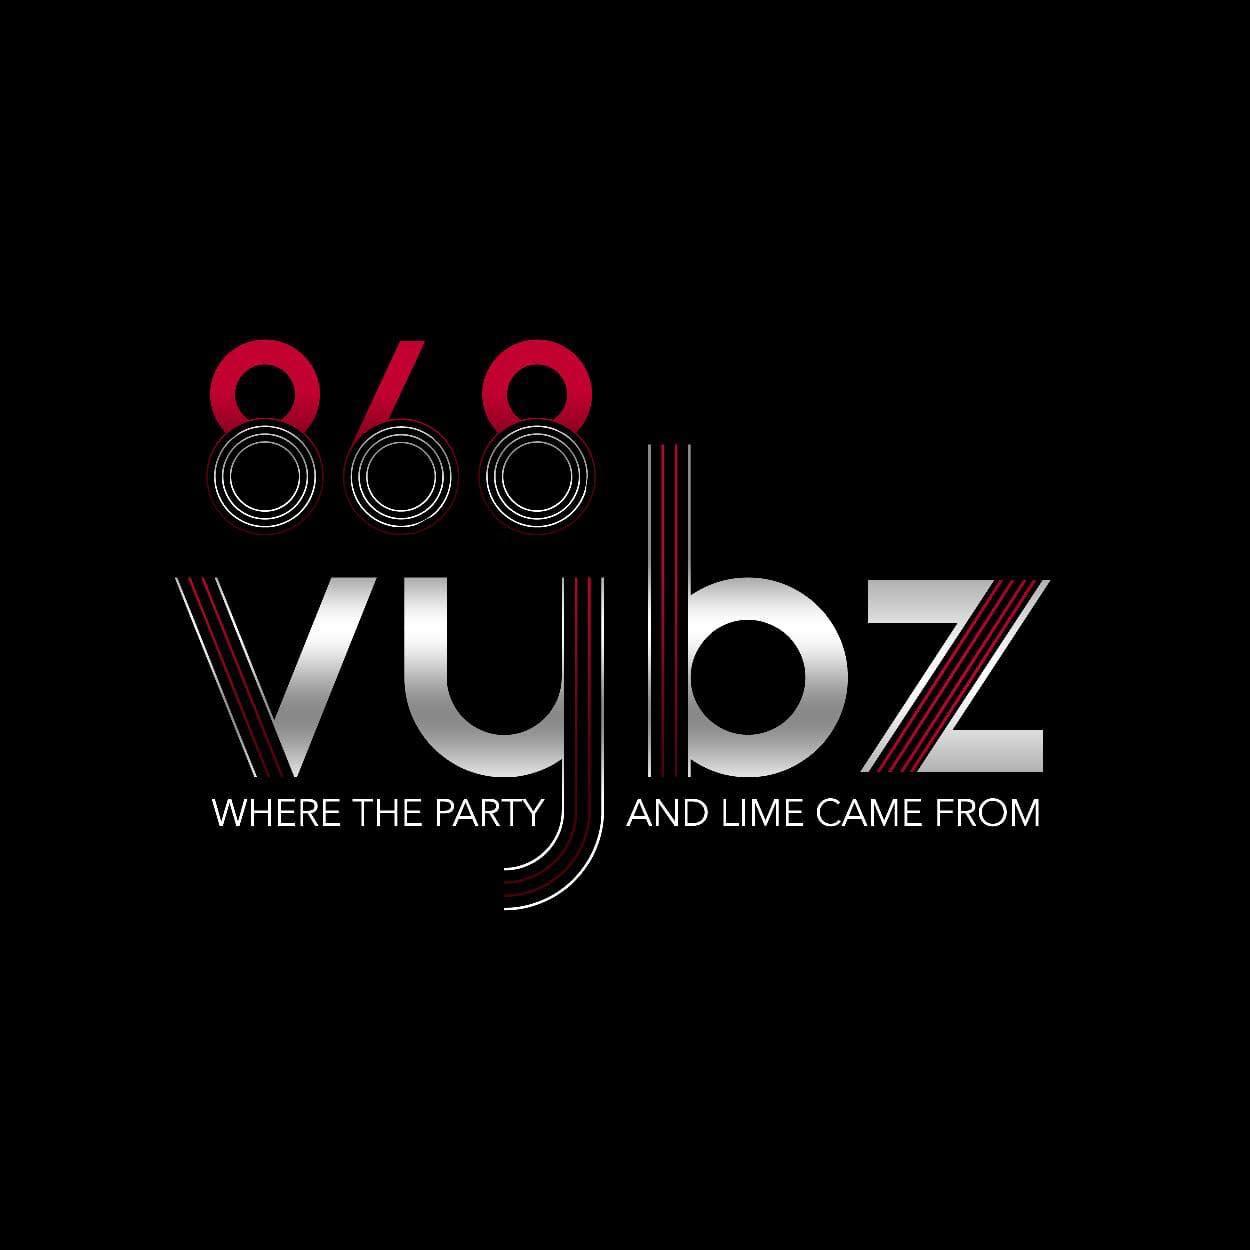 868 Vybz Sports Bar